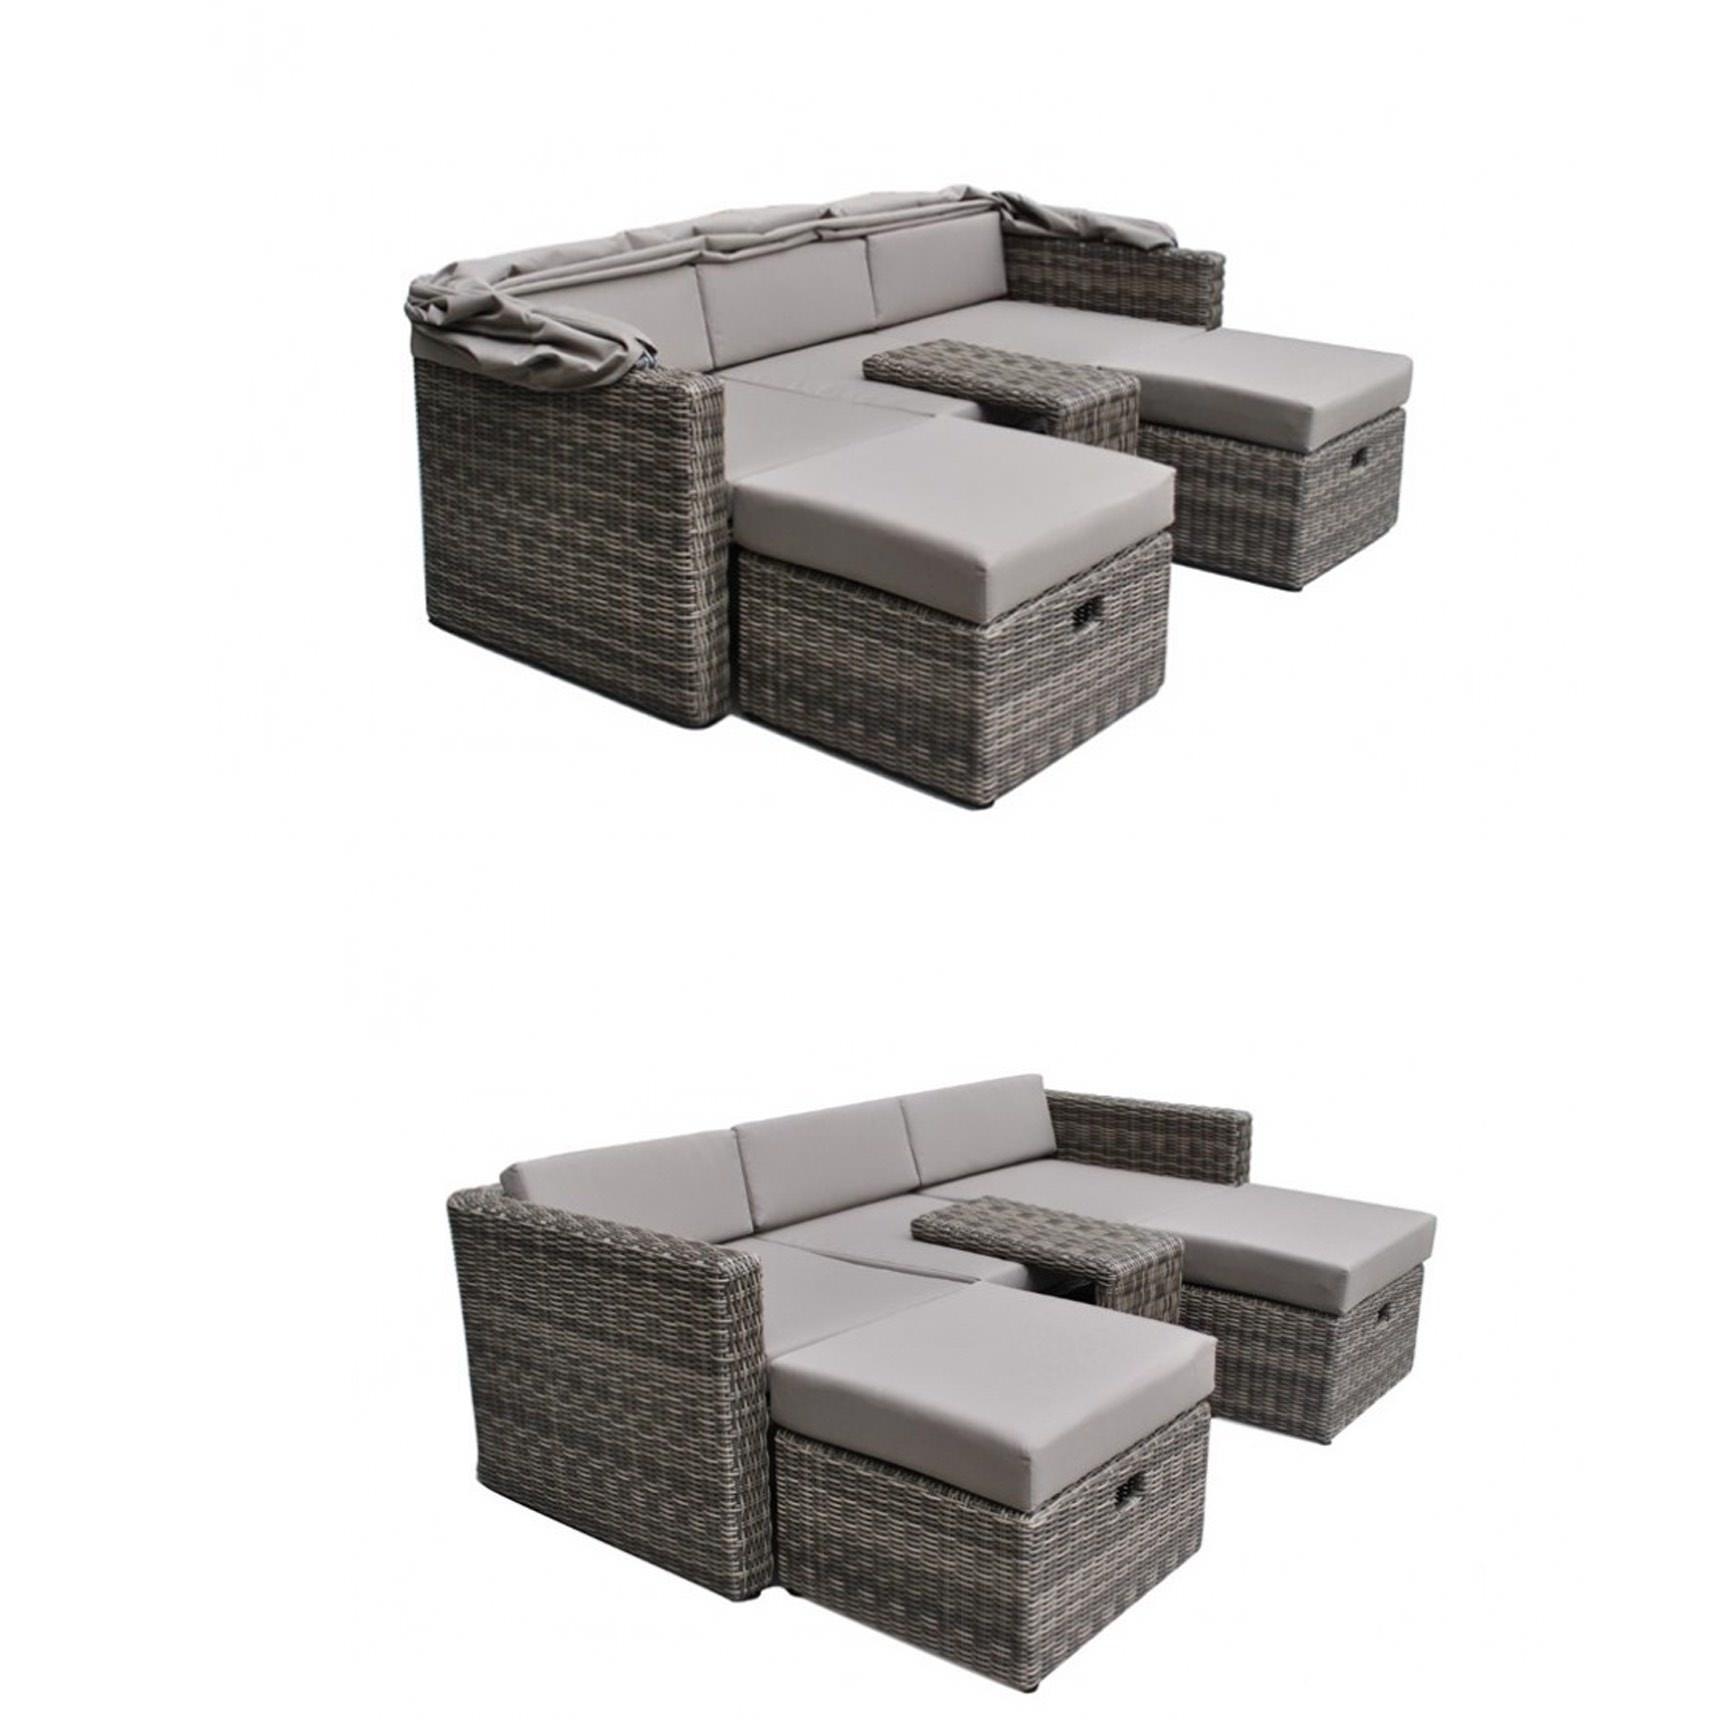 sofa lounge hannover elegant sofa poly rattan lounge in schwarz in hannover with sofa lounge. Black Bedroom Furniture Sets. Home Design Ideas